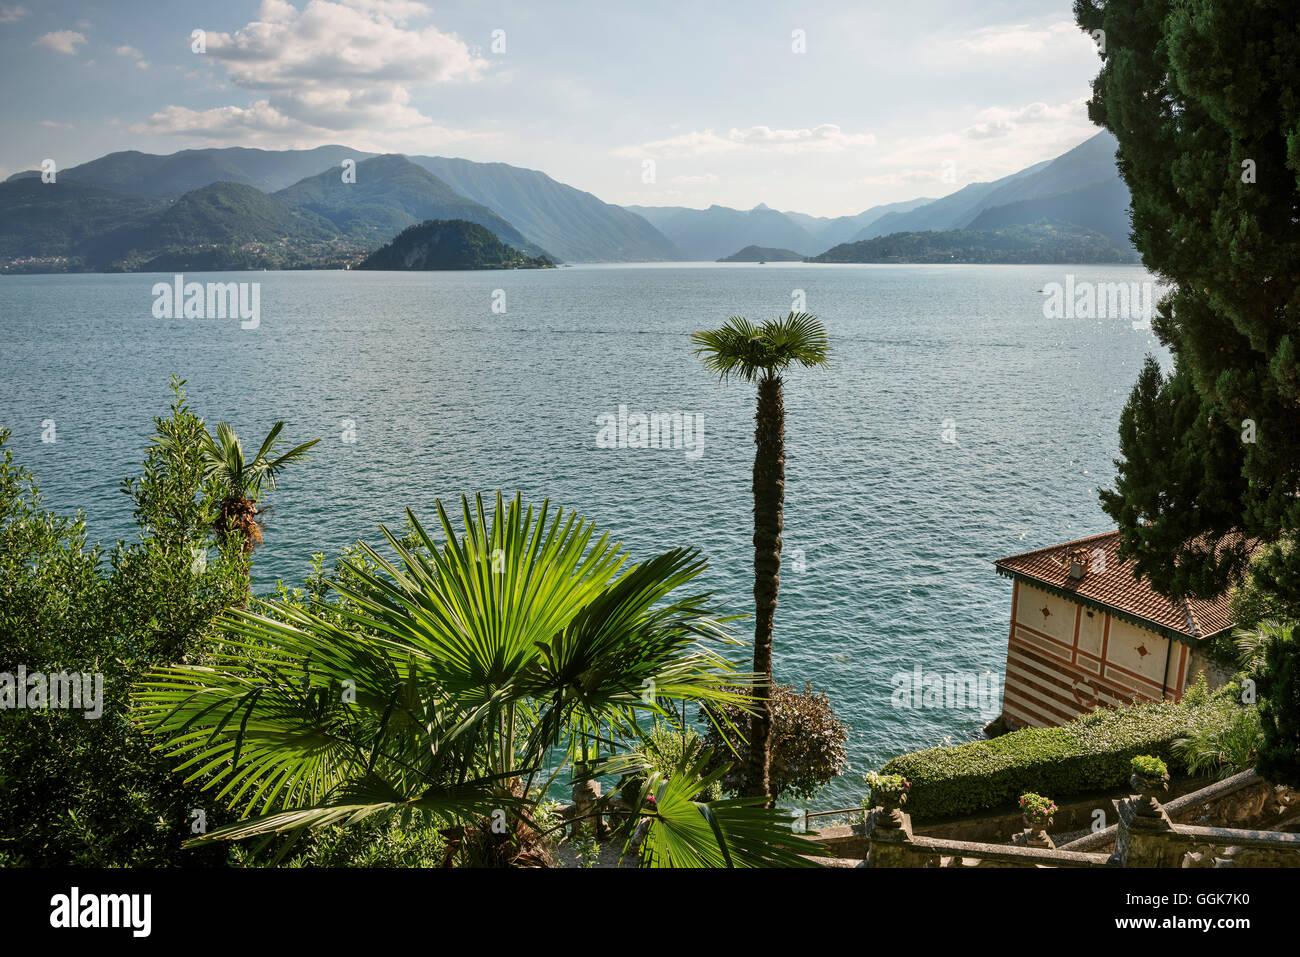 view across Villa Monastero and Lake Como, Varenna, Lombardy, Italy, Europe - Stock Image